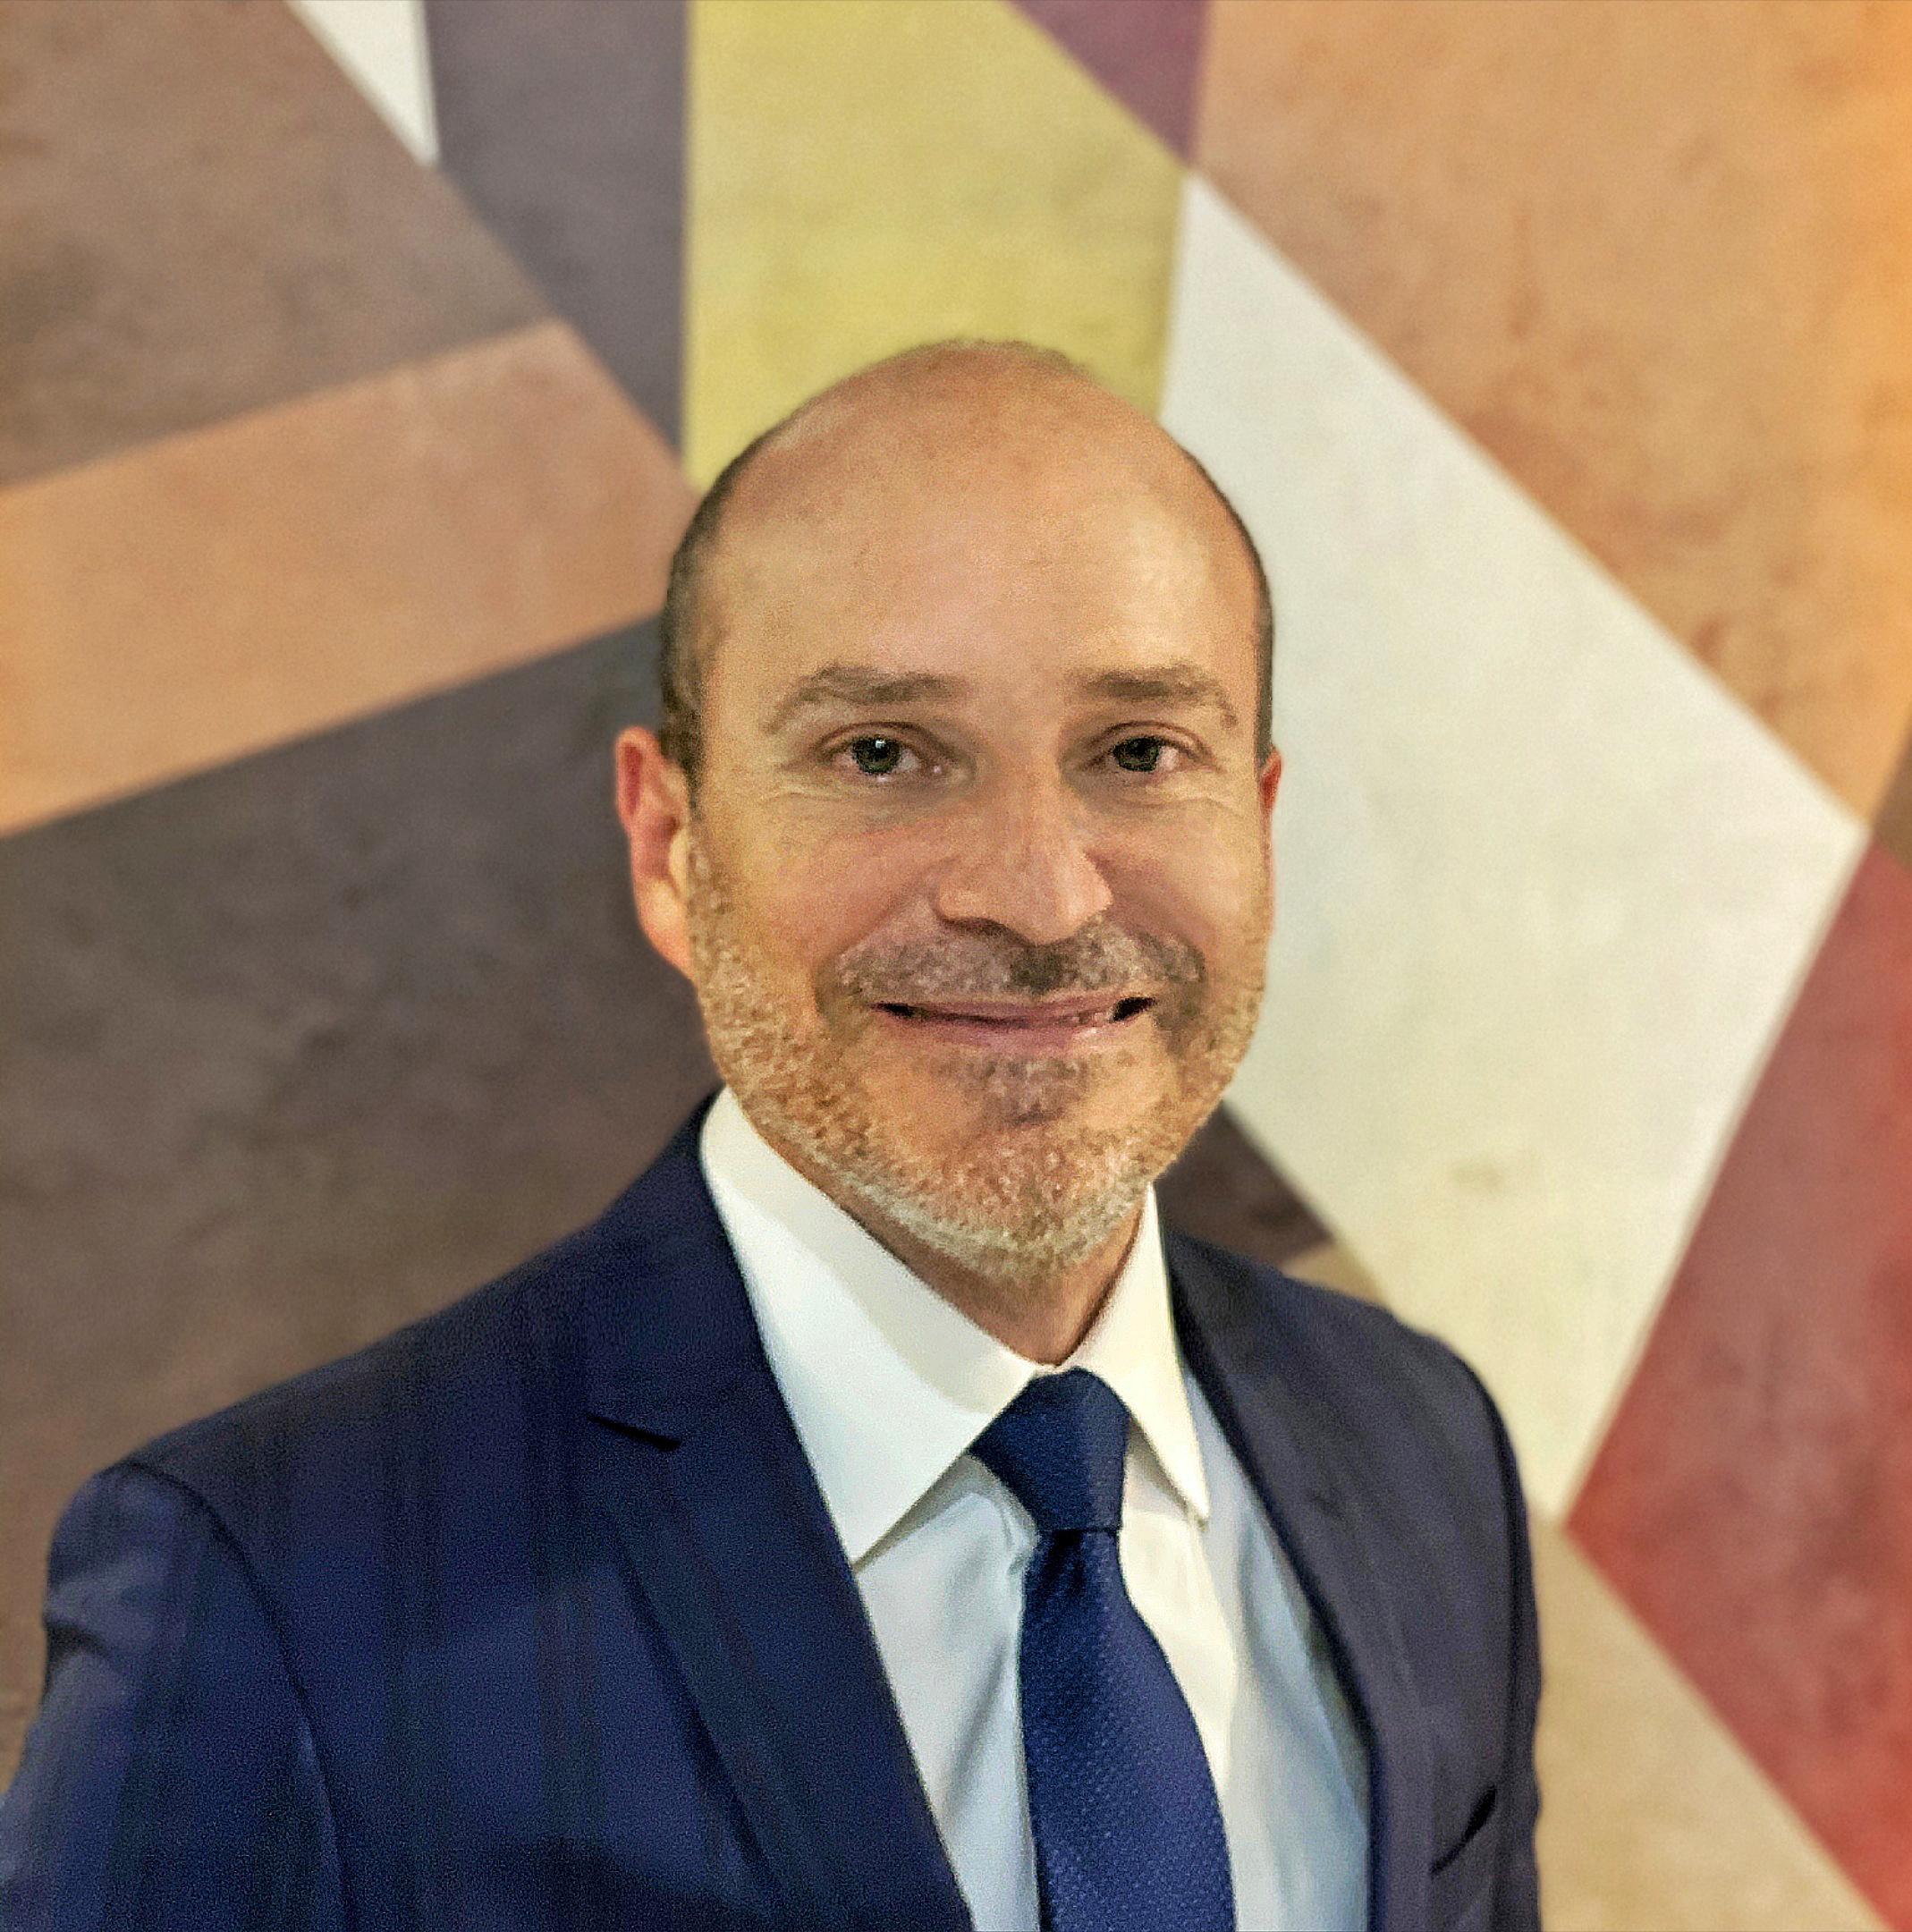 Maurício Sirihal Werkema